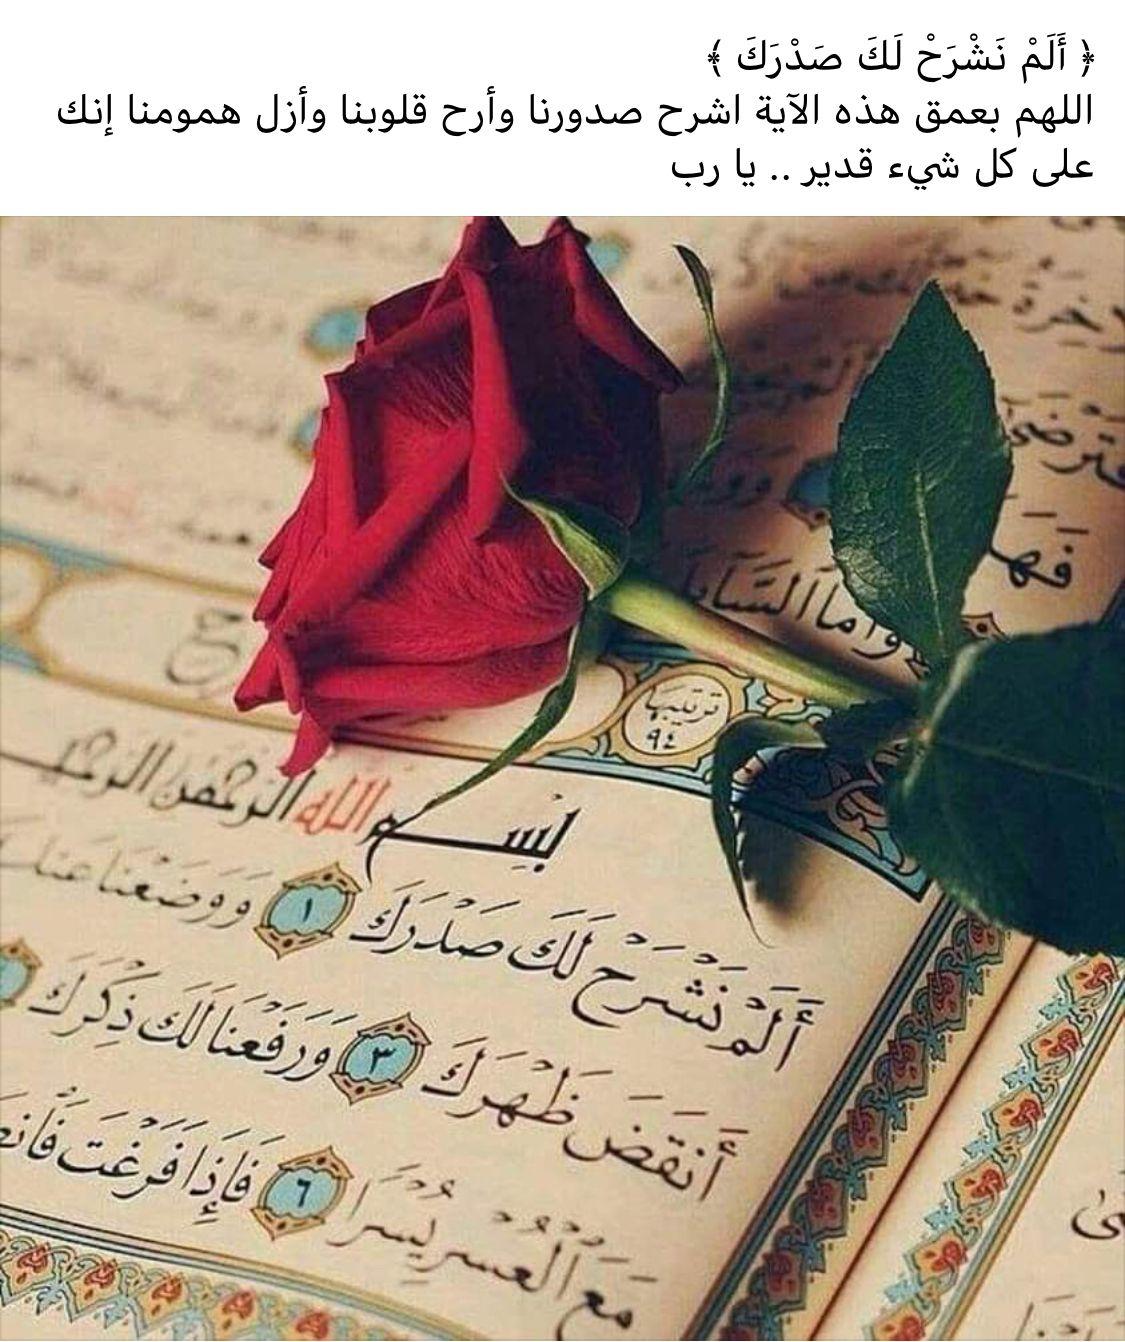 Pin By Lama Mokhtar On Duea دعاء Quran Islamic Phrases Islamic Quotes